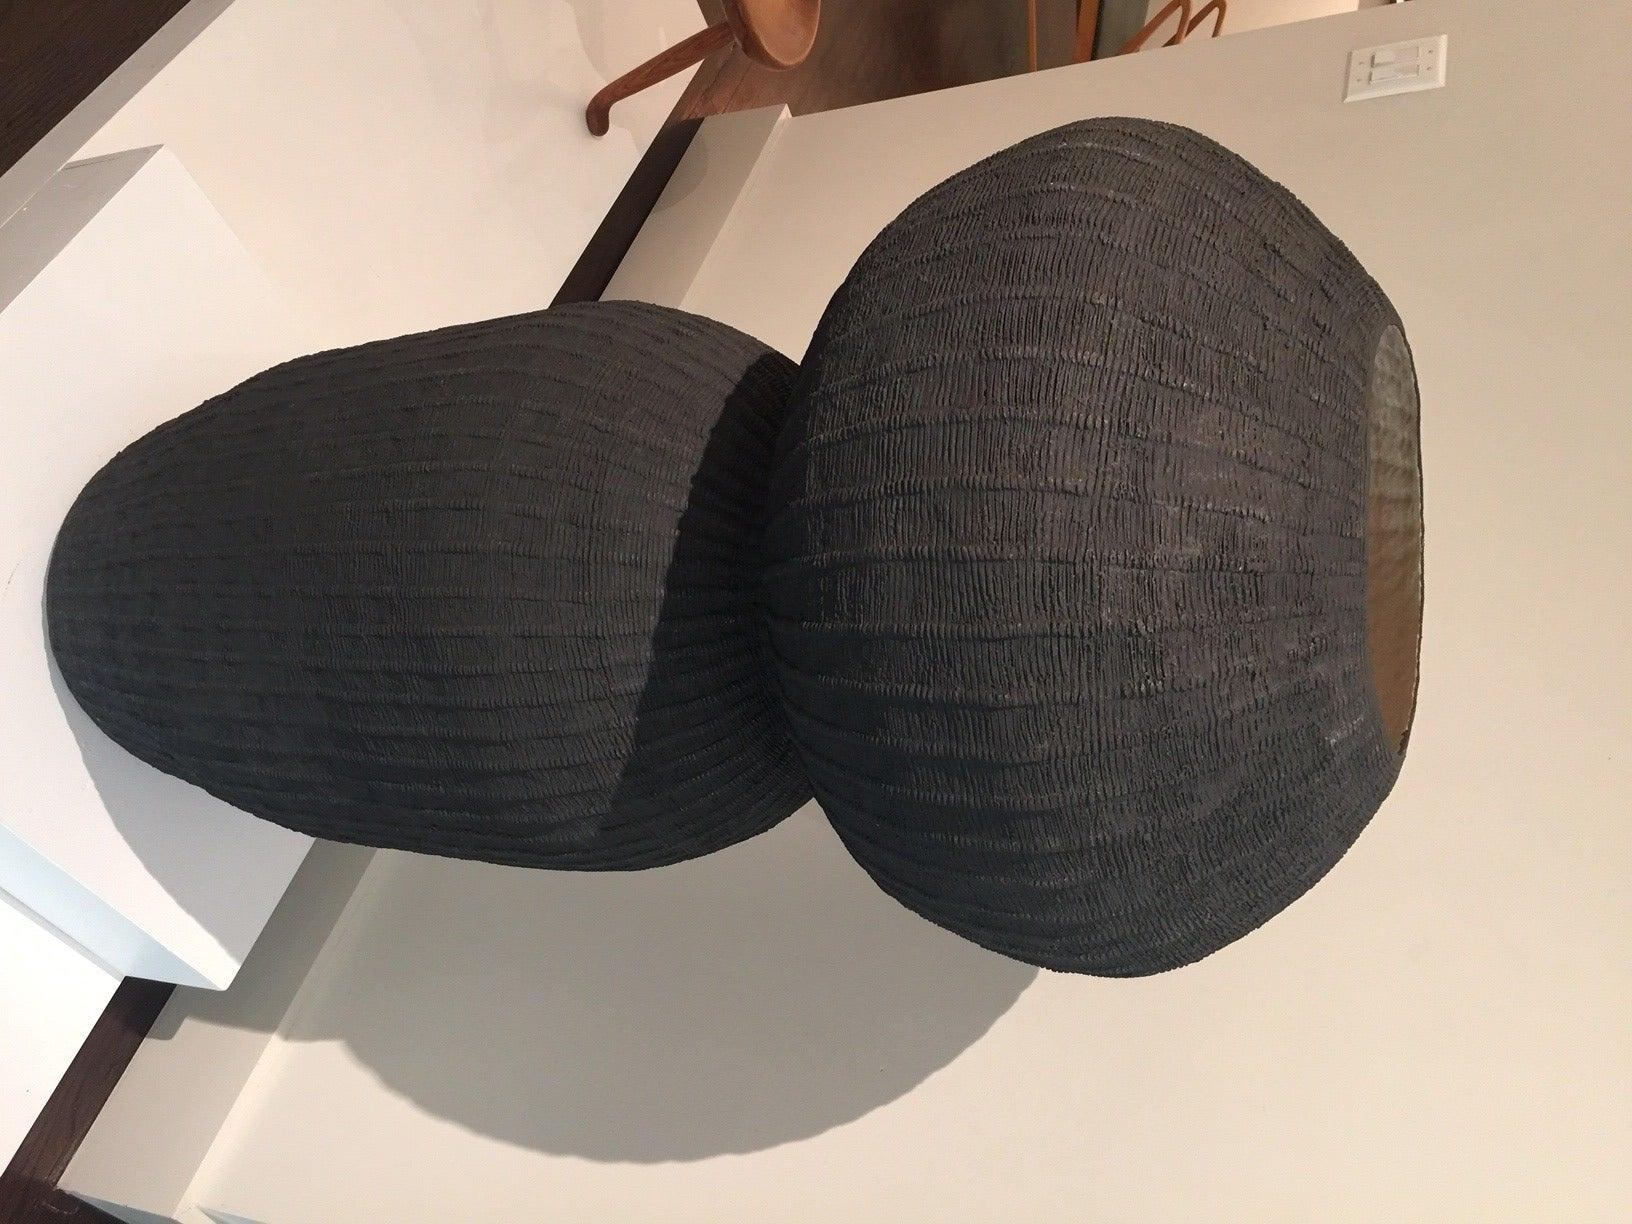 Hand-Crafted Kristina Riska Ceramic Floor Urn, 2015 For Sale